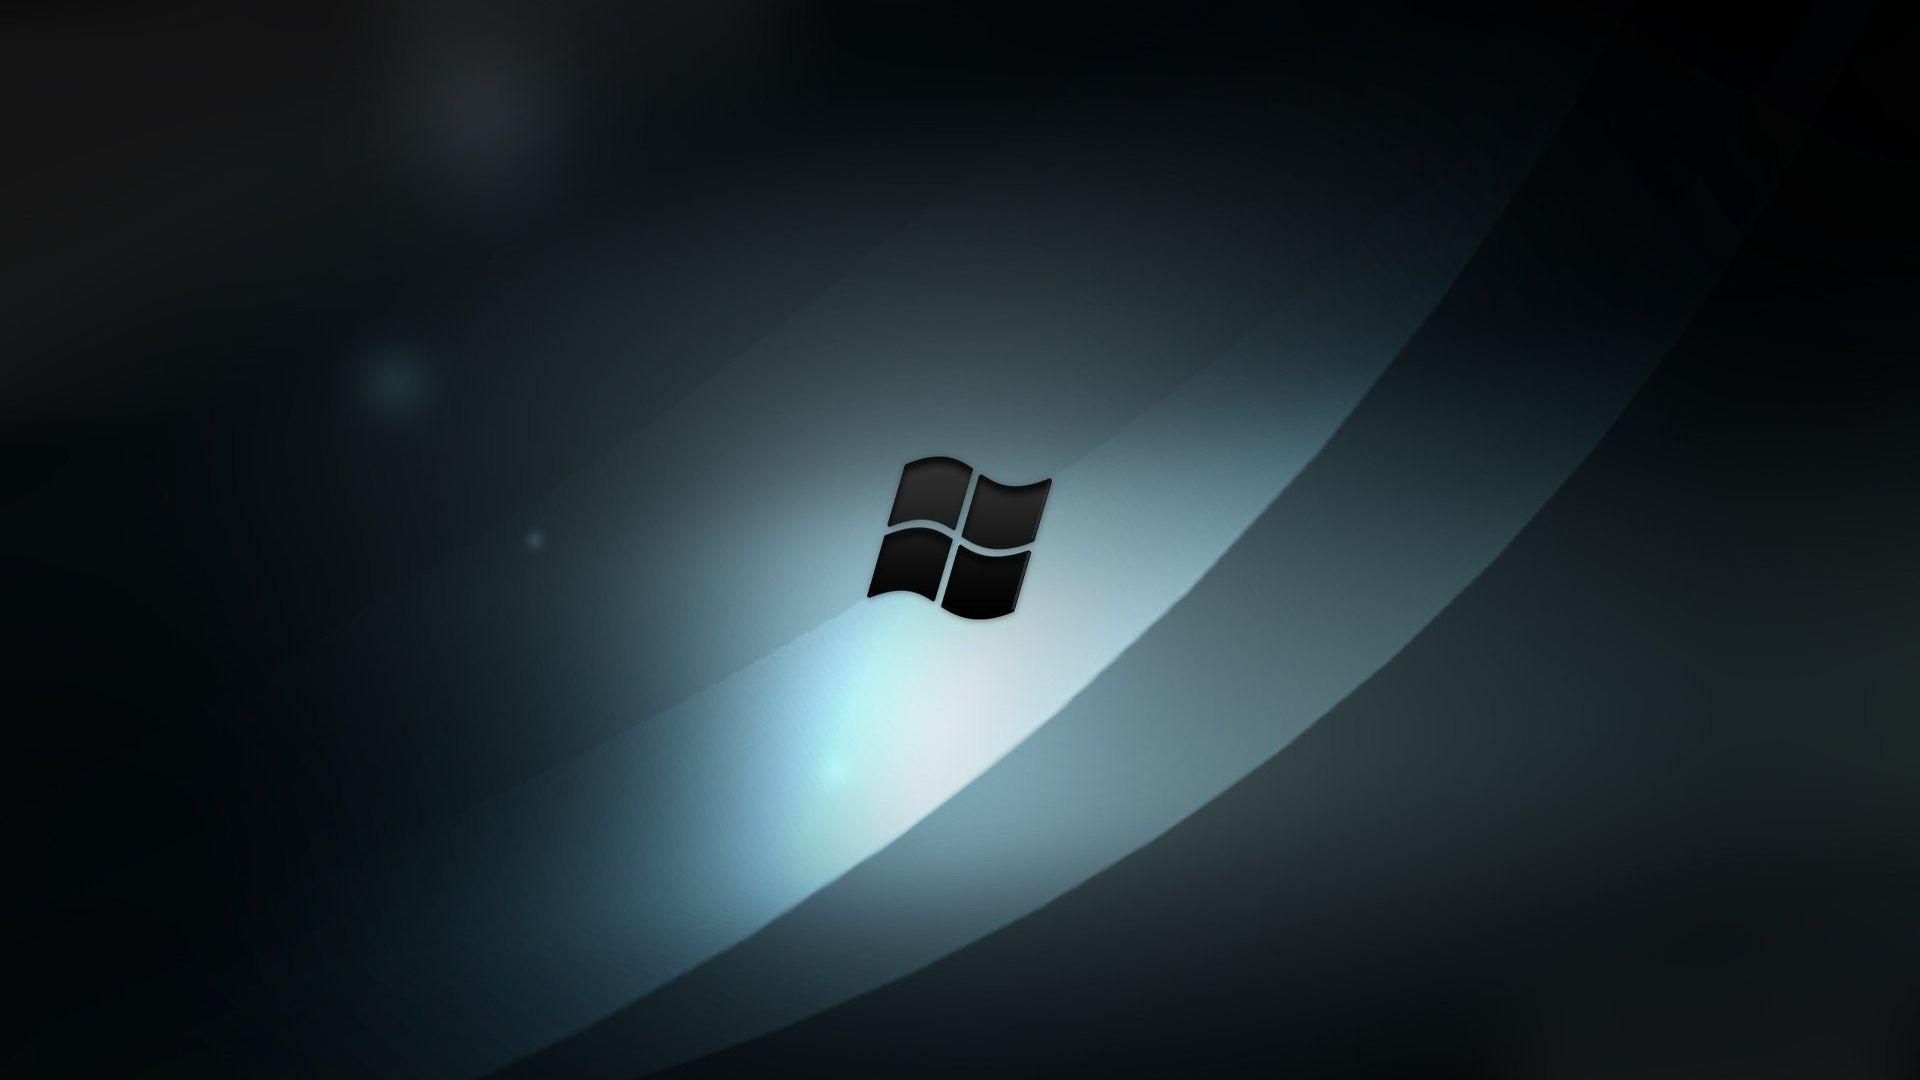 Trololo blogg windows hd wallpaper 1920 1080 hd windows 7 - Windows 10 wallpaper hd 1080p ...